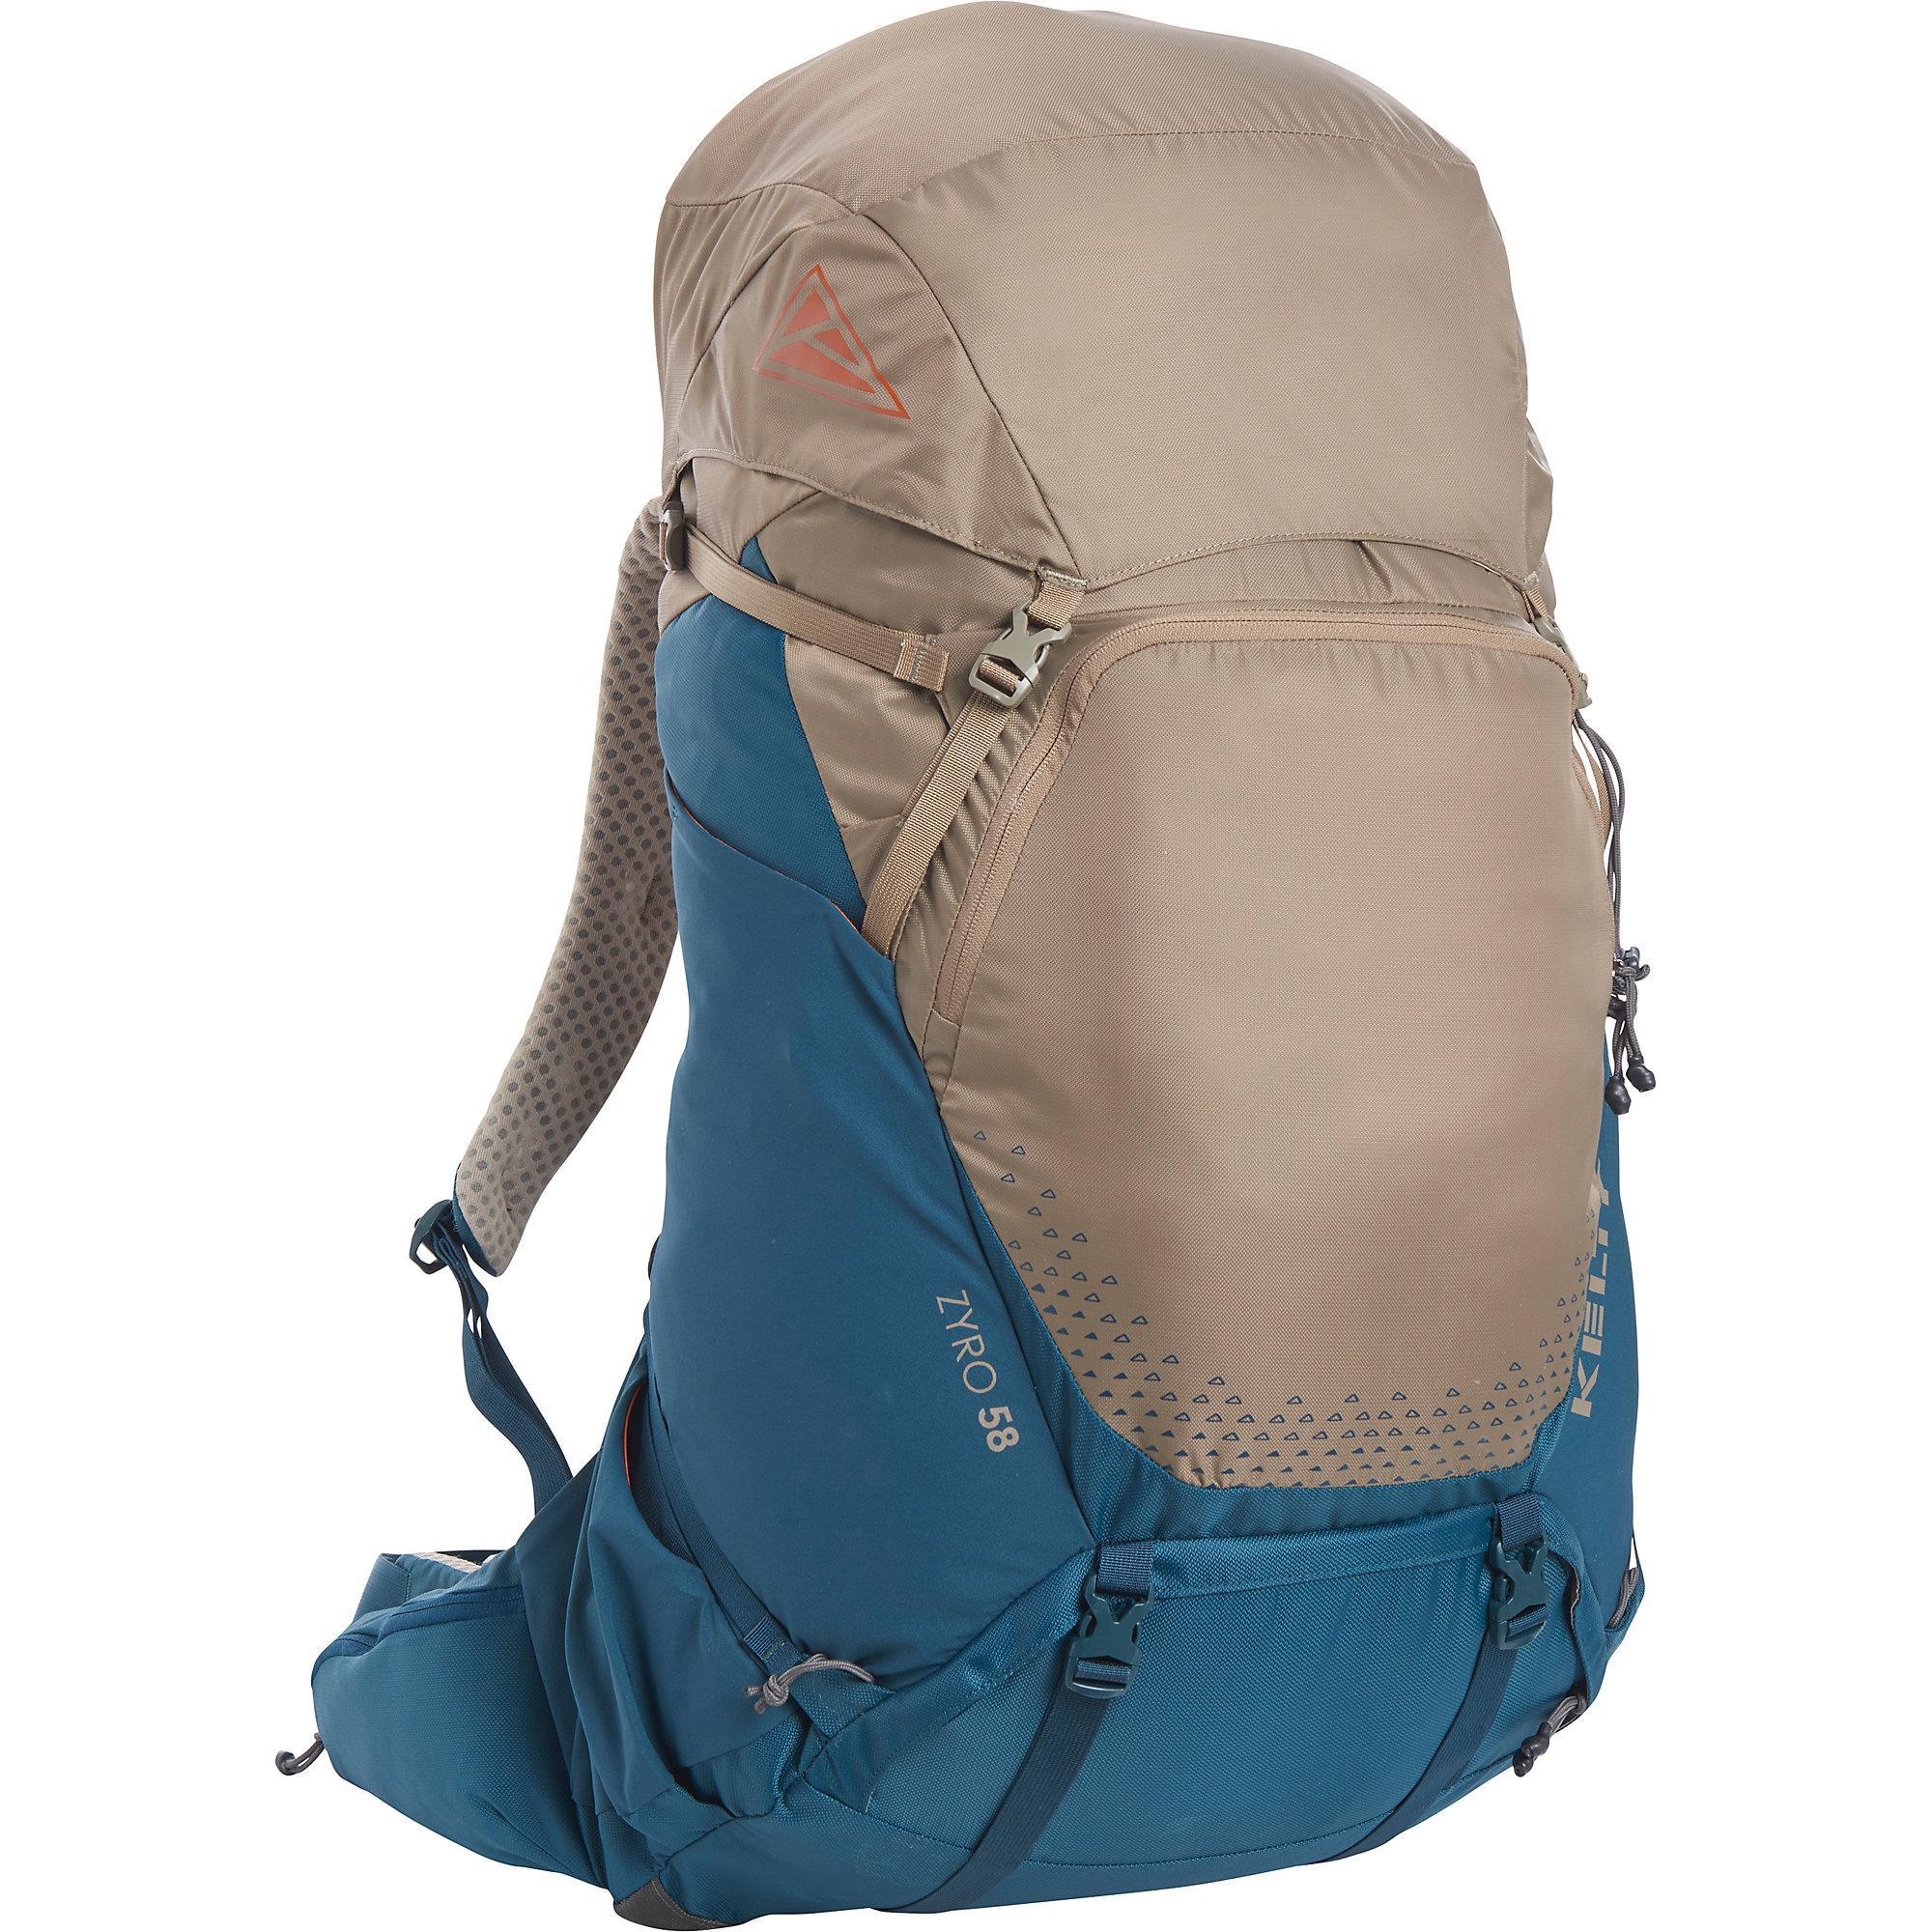 33c4c00ec Kelty Zyro 58l Backpack in Blue - Lyst